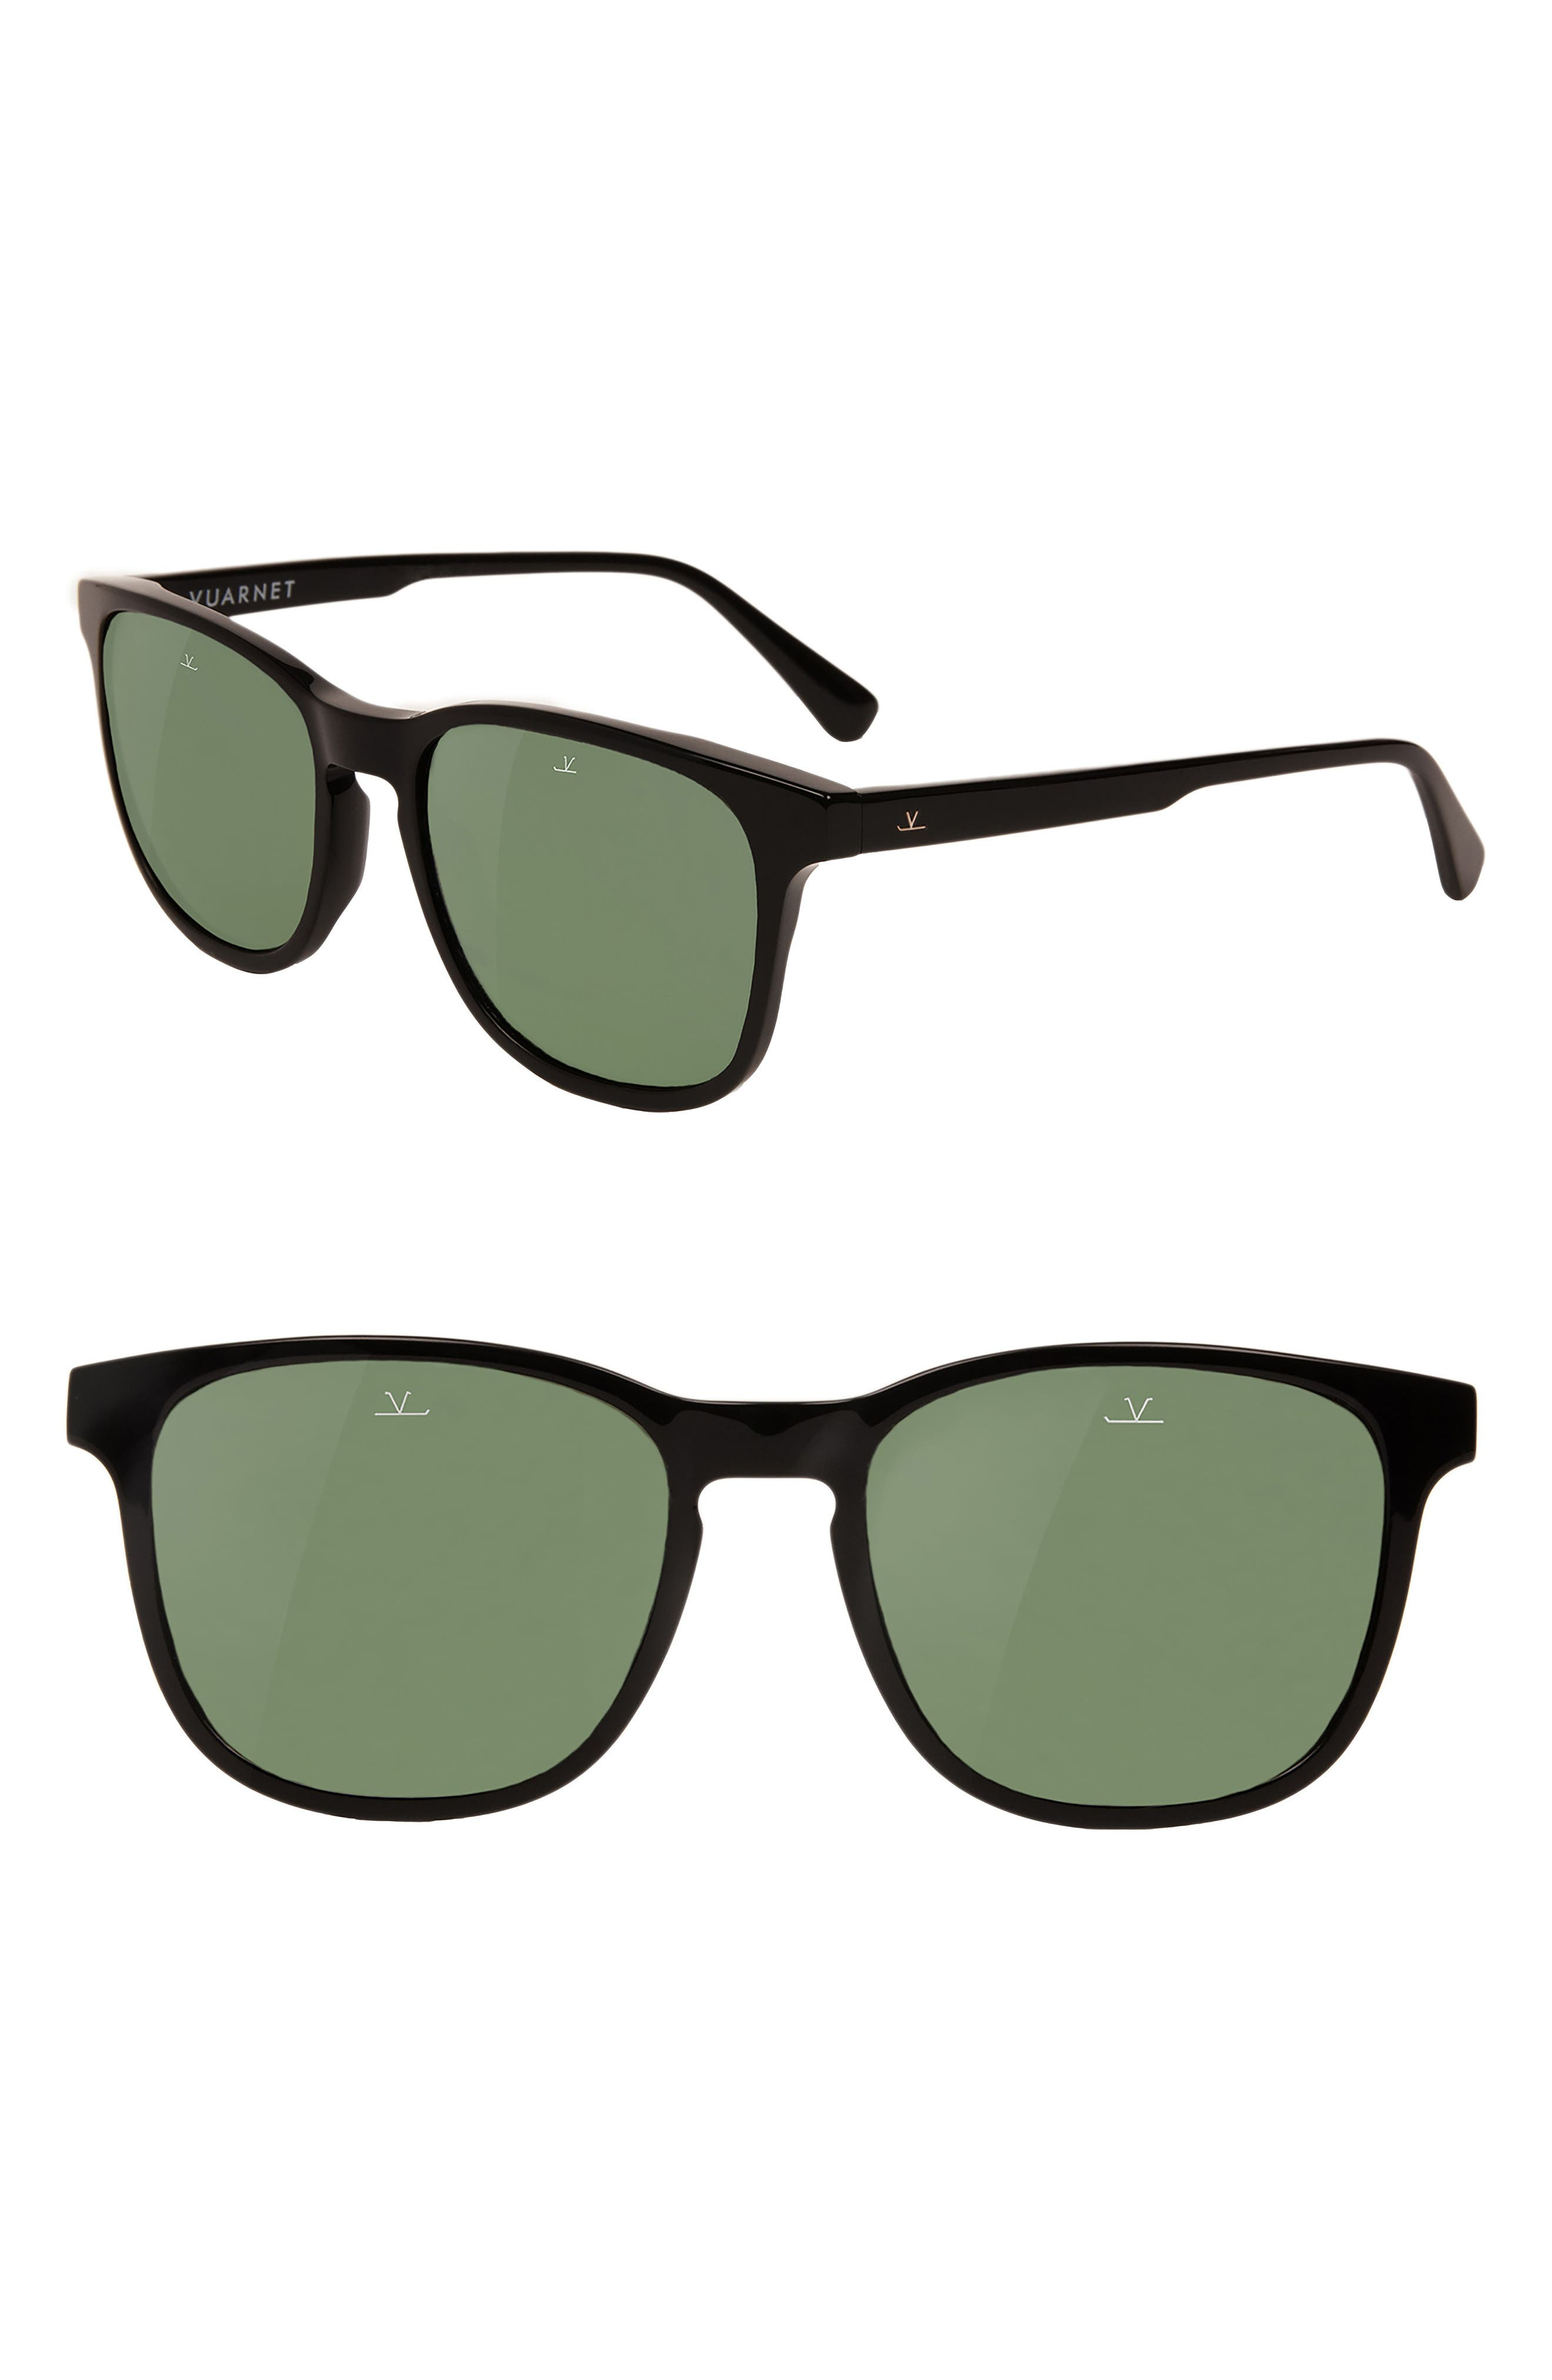 District Medium 53mm Sunglasses,                             Main thumbnail 1, color,                             PURE GREY